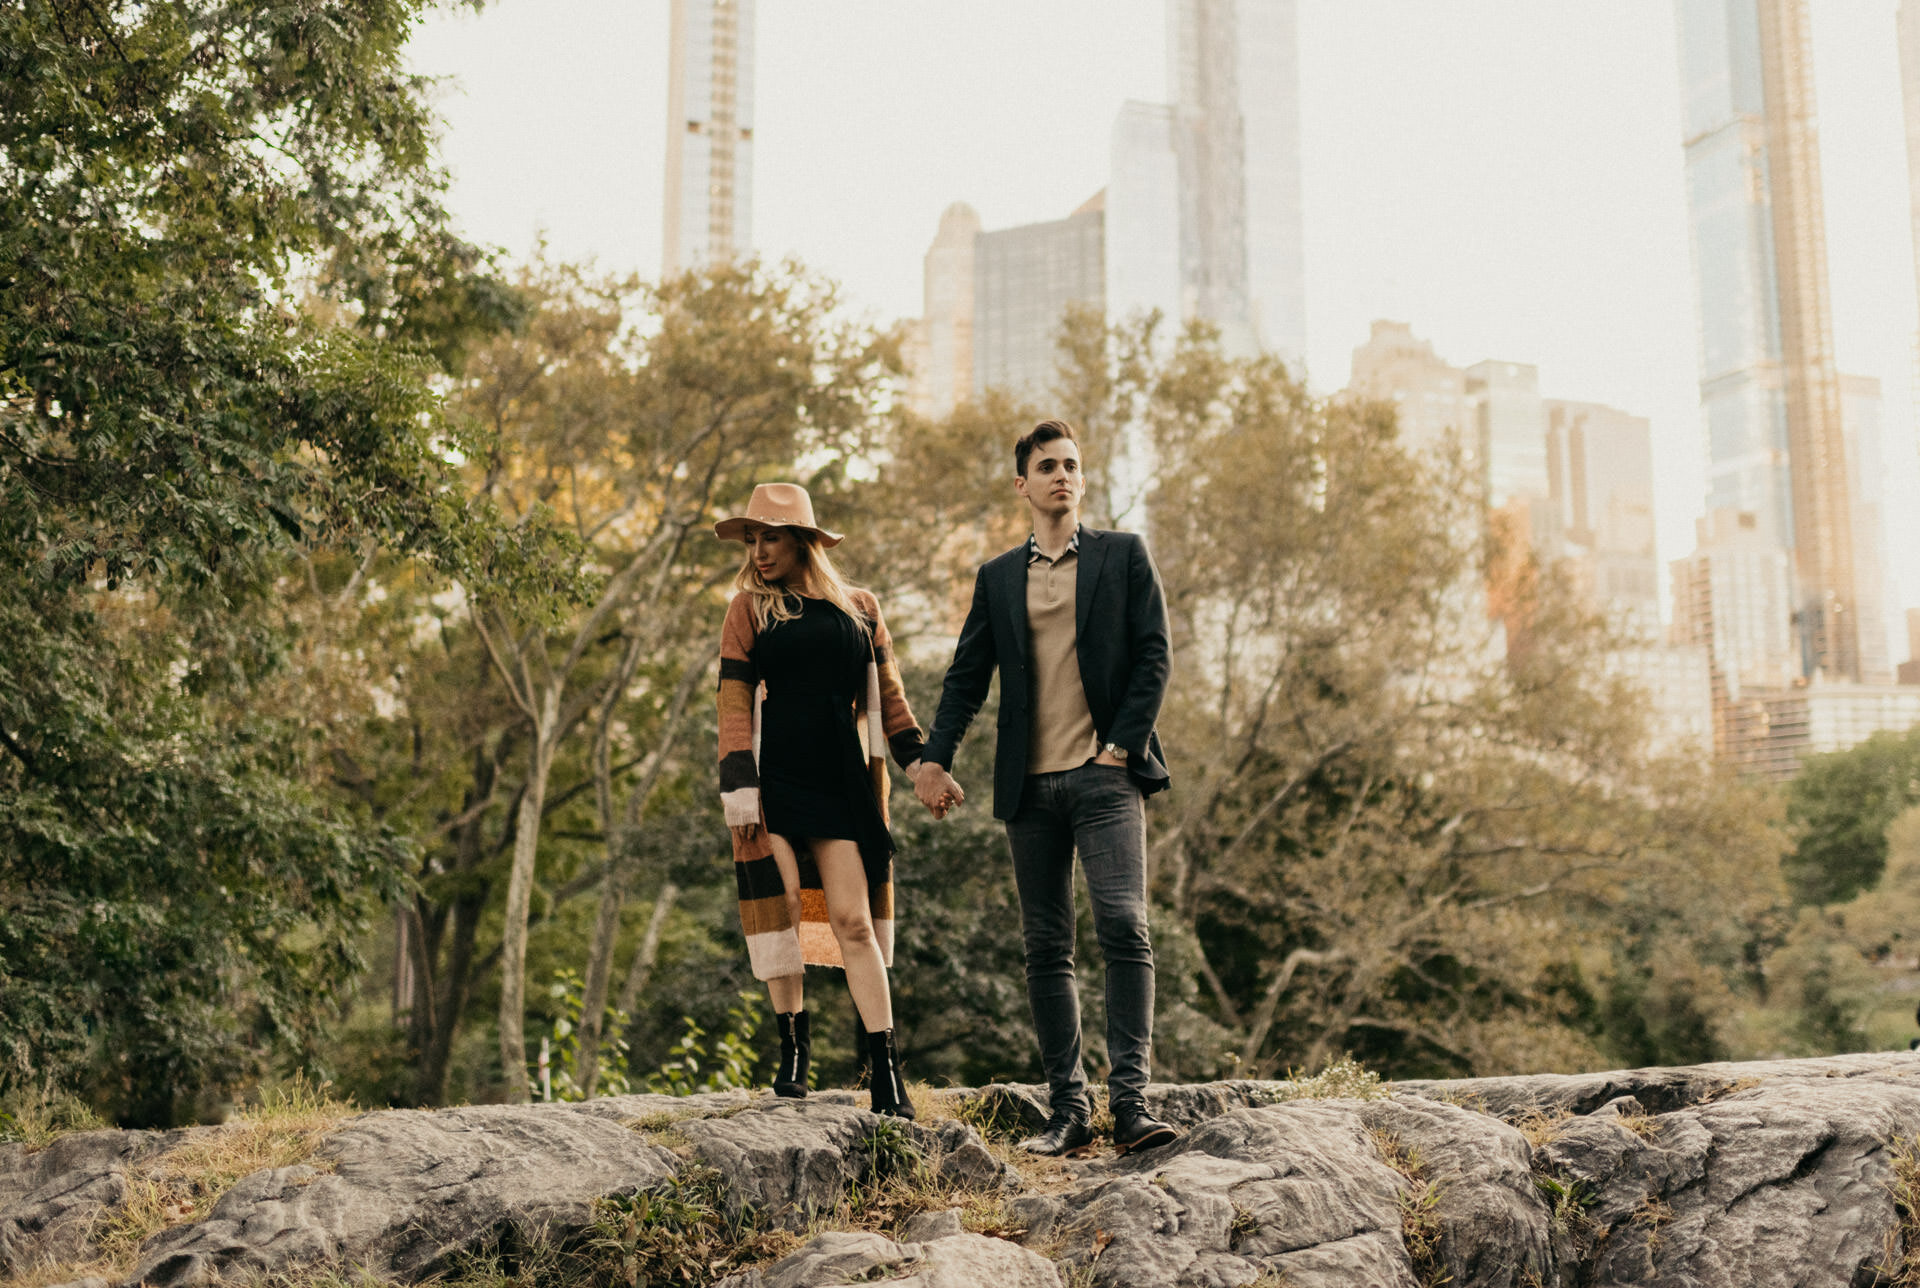 fall-october-new-york-central-park-couples-engagement-session-photographer-houston-manhattan-skyline